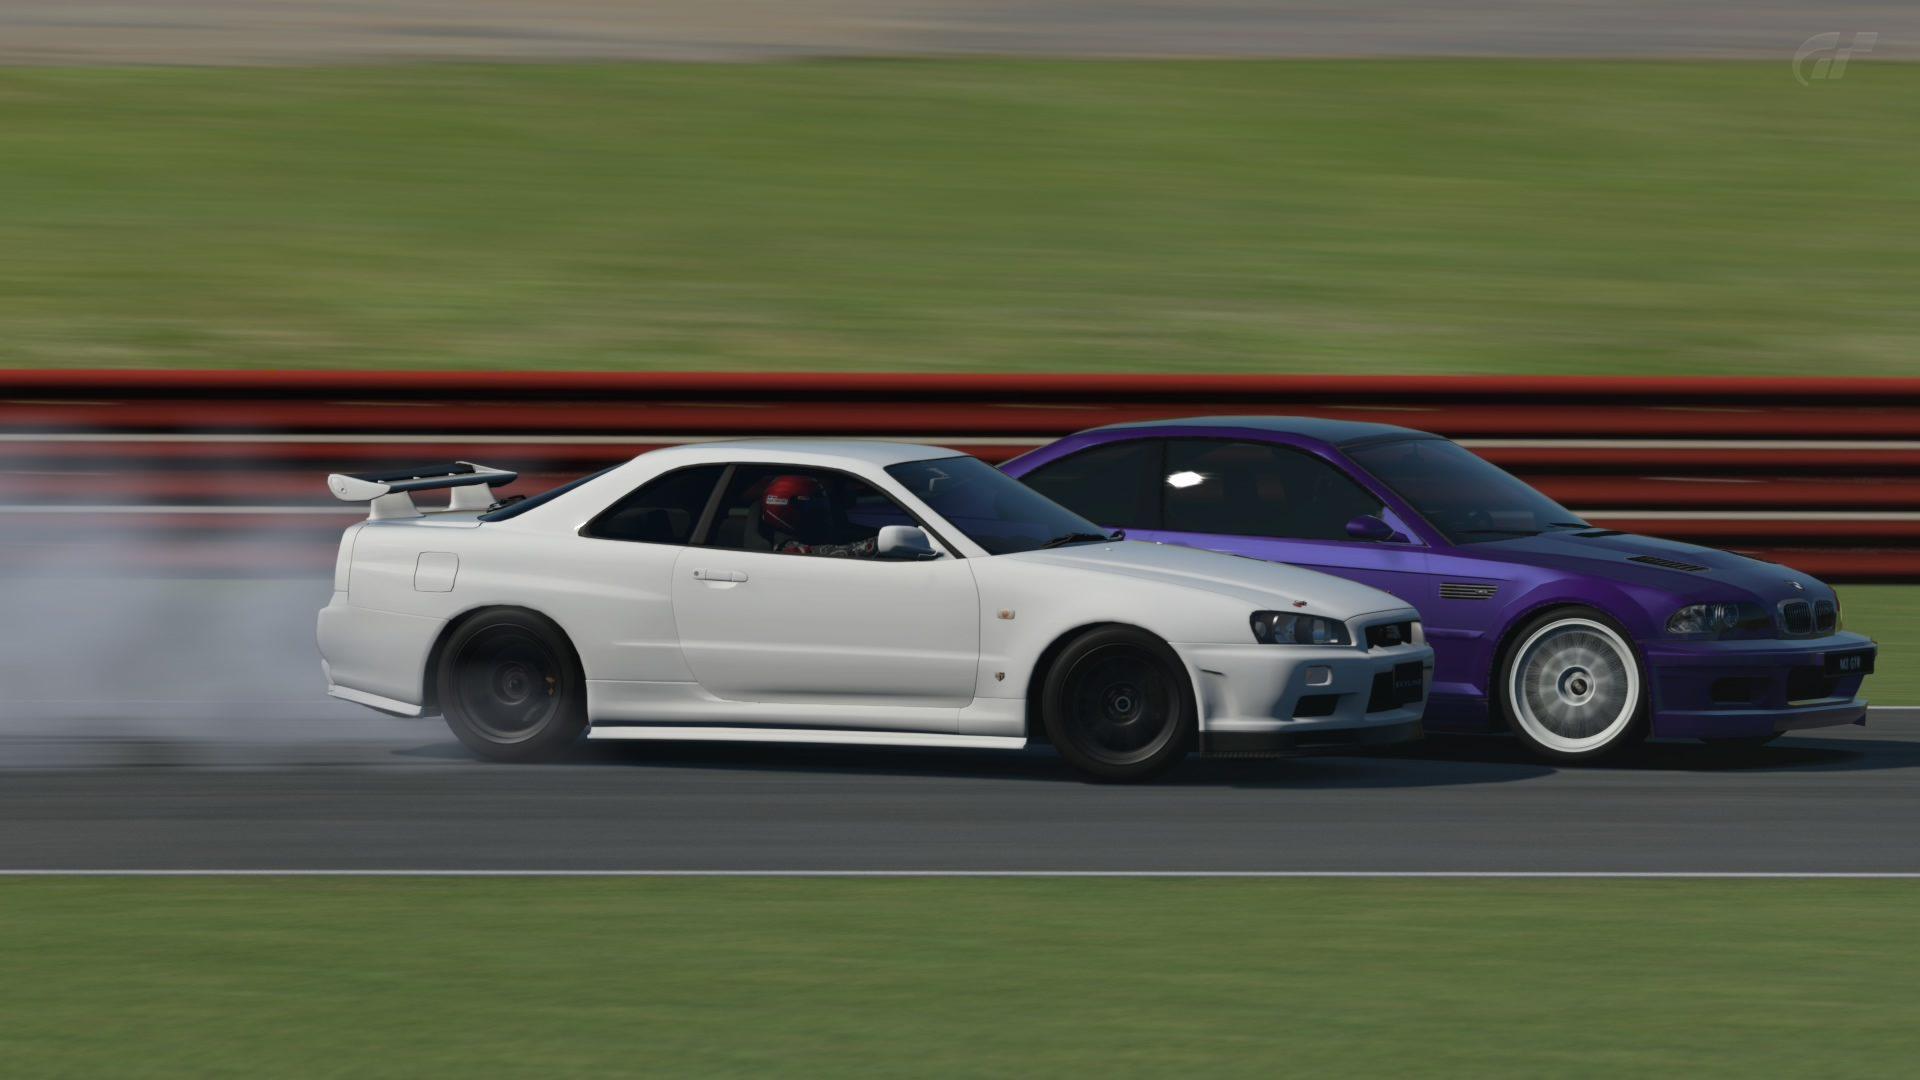 Silverstone_ Stowe Circuit_8.jpg